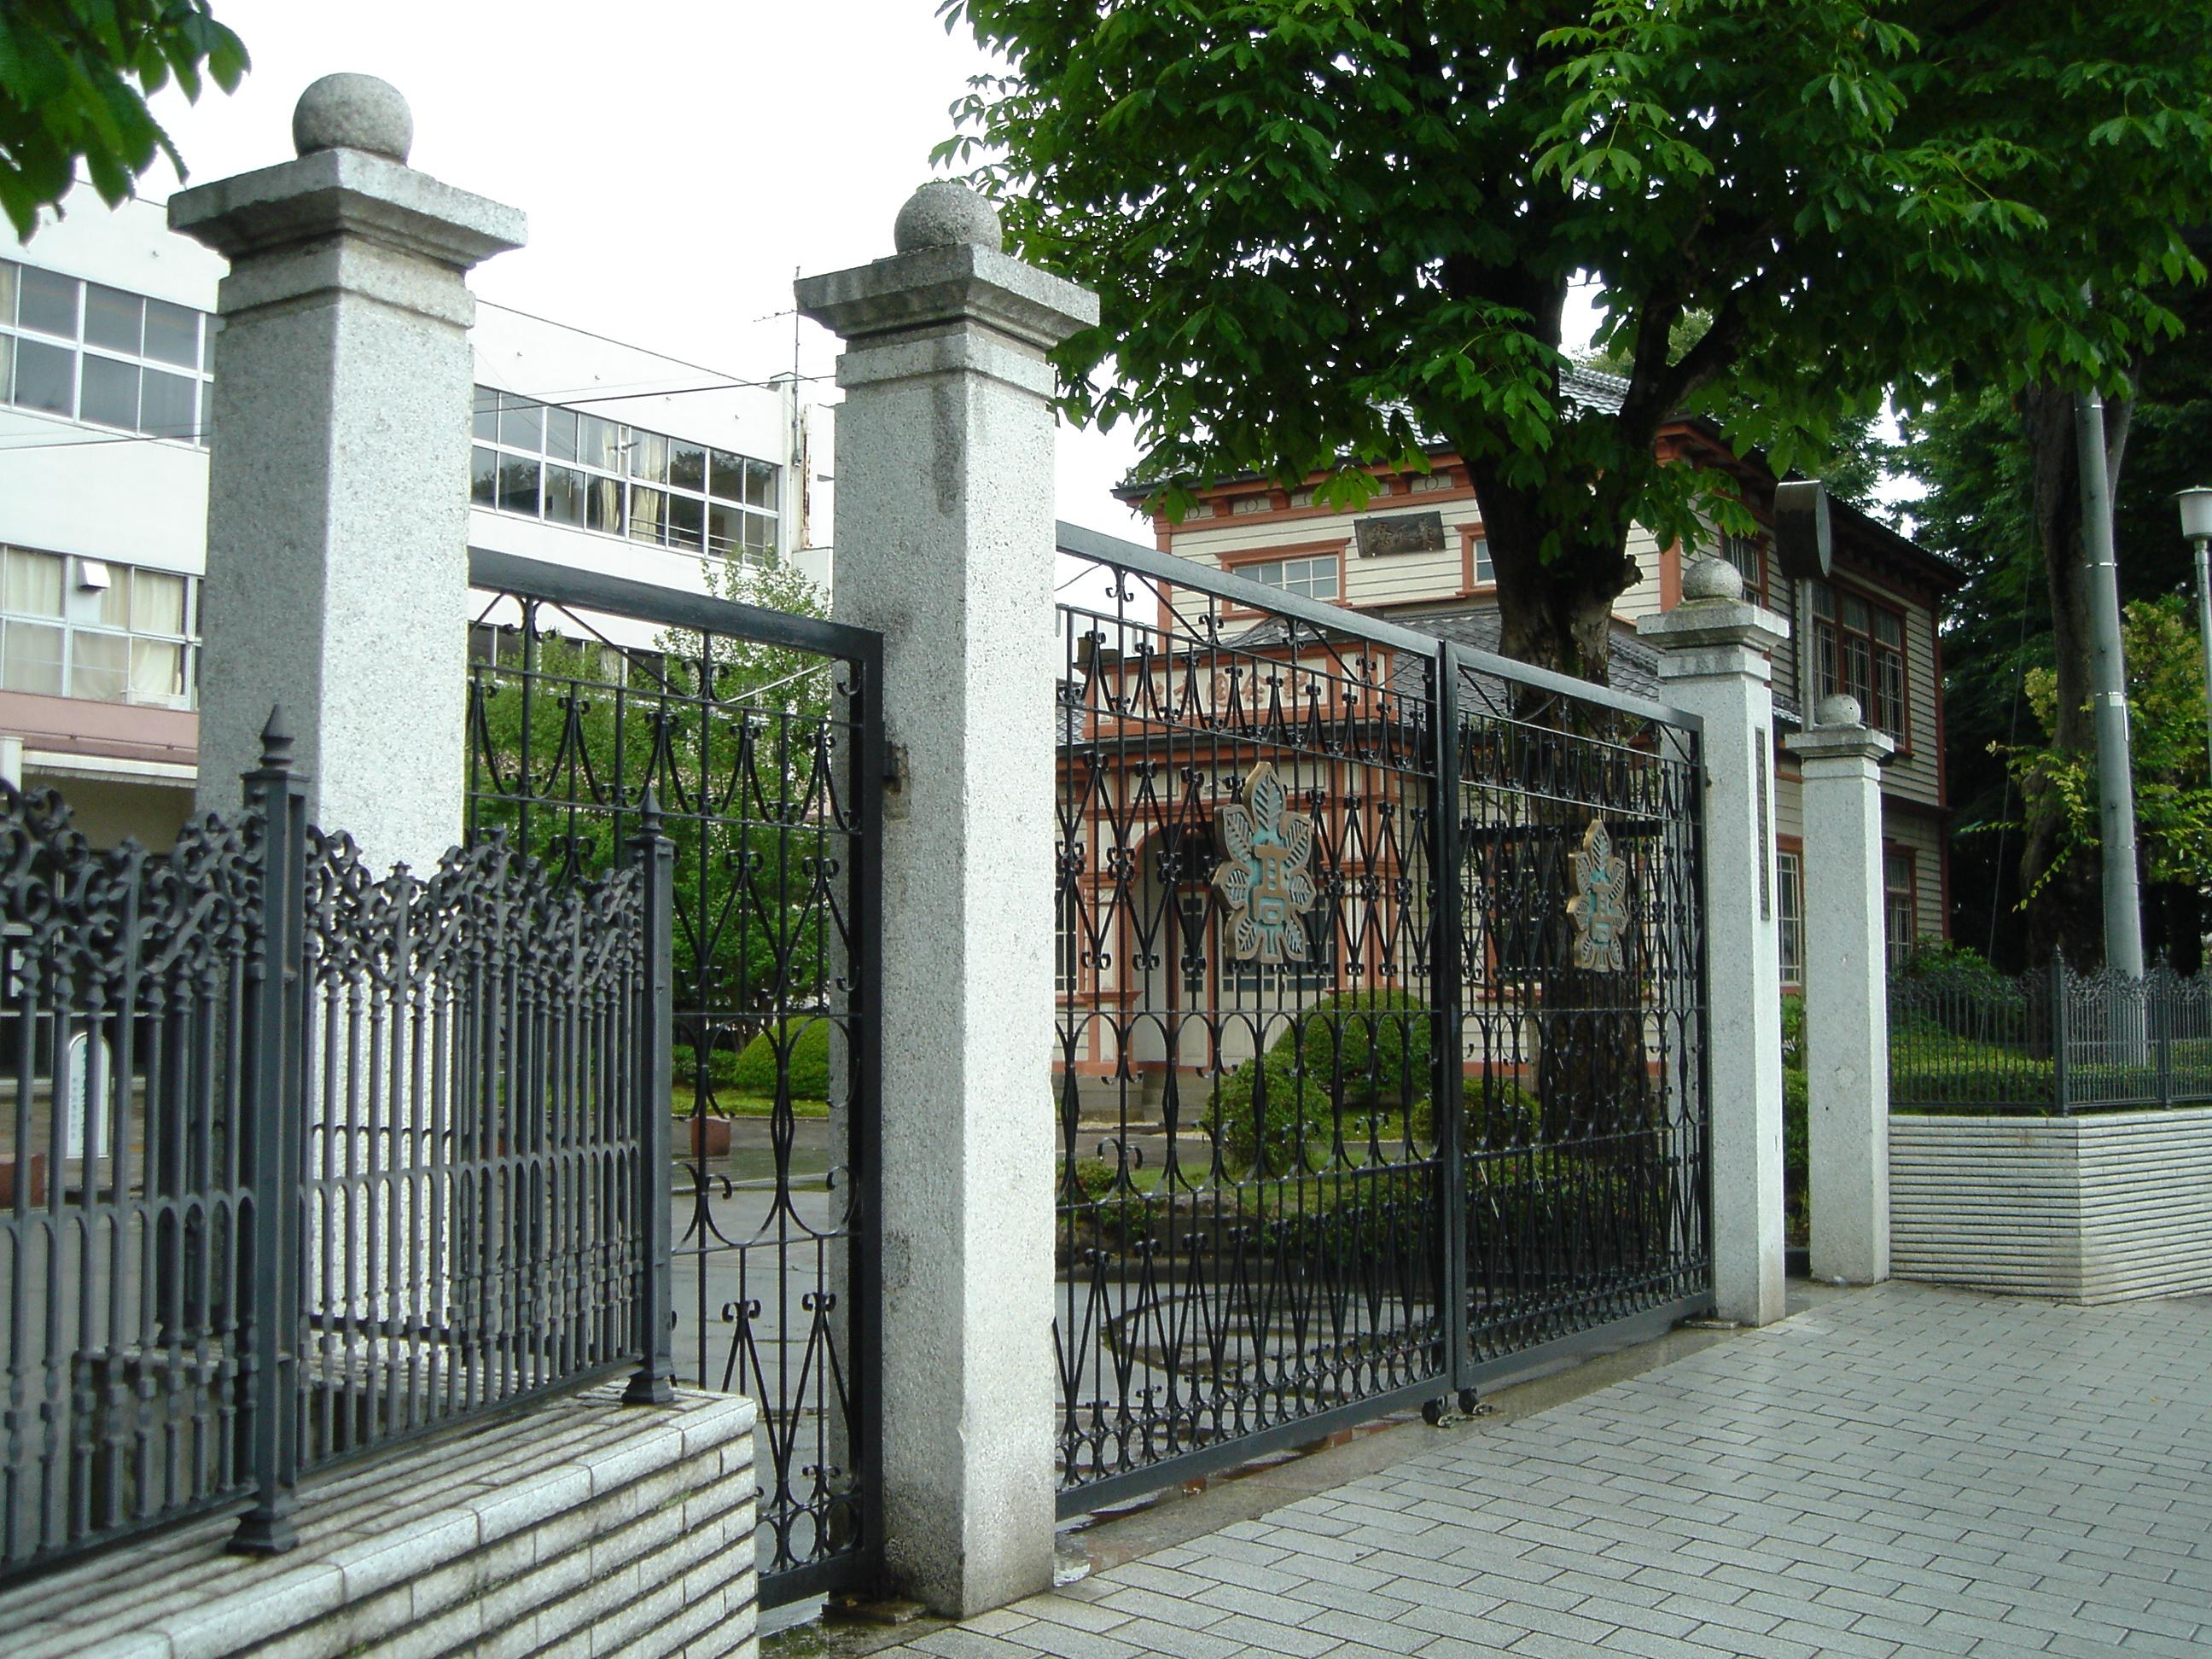 File:The Tochigi High School main gate 1.JPG - Wikimedia ...